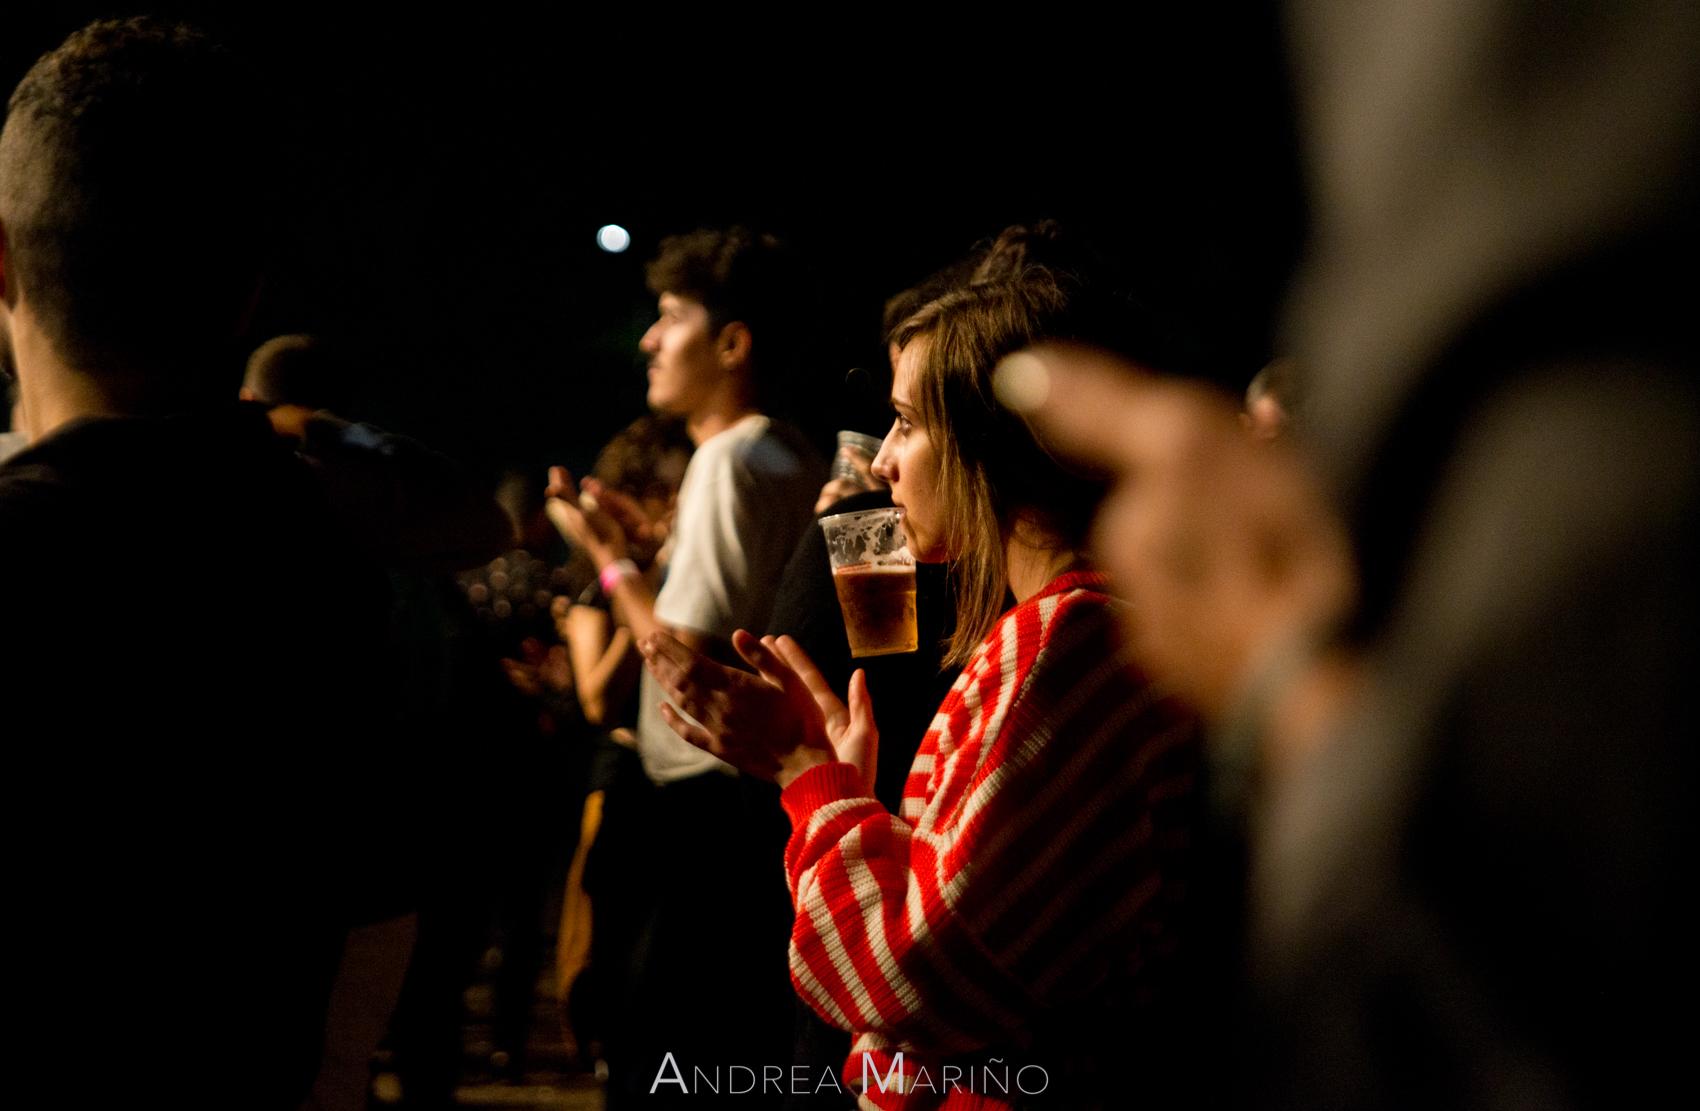 Andrea Mariño. Público. Vive Nigrán. Nigrán. 20/7/18